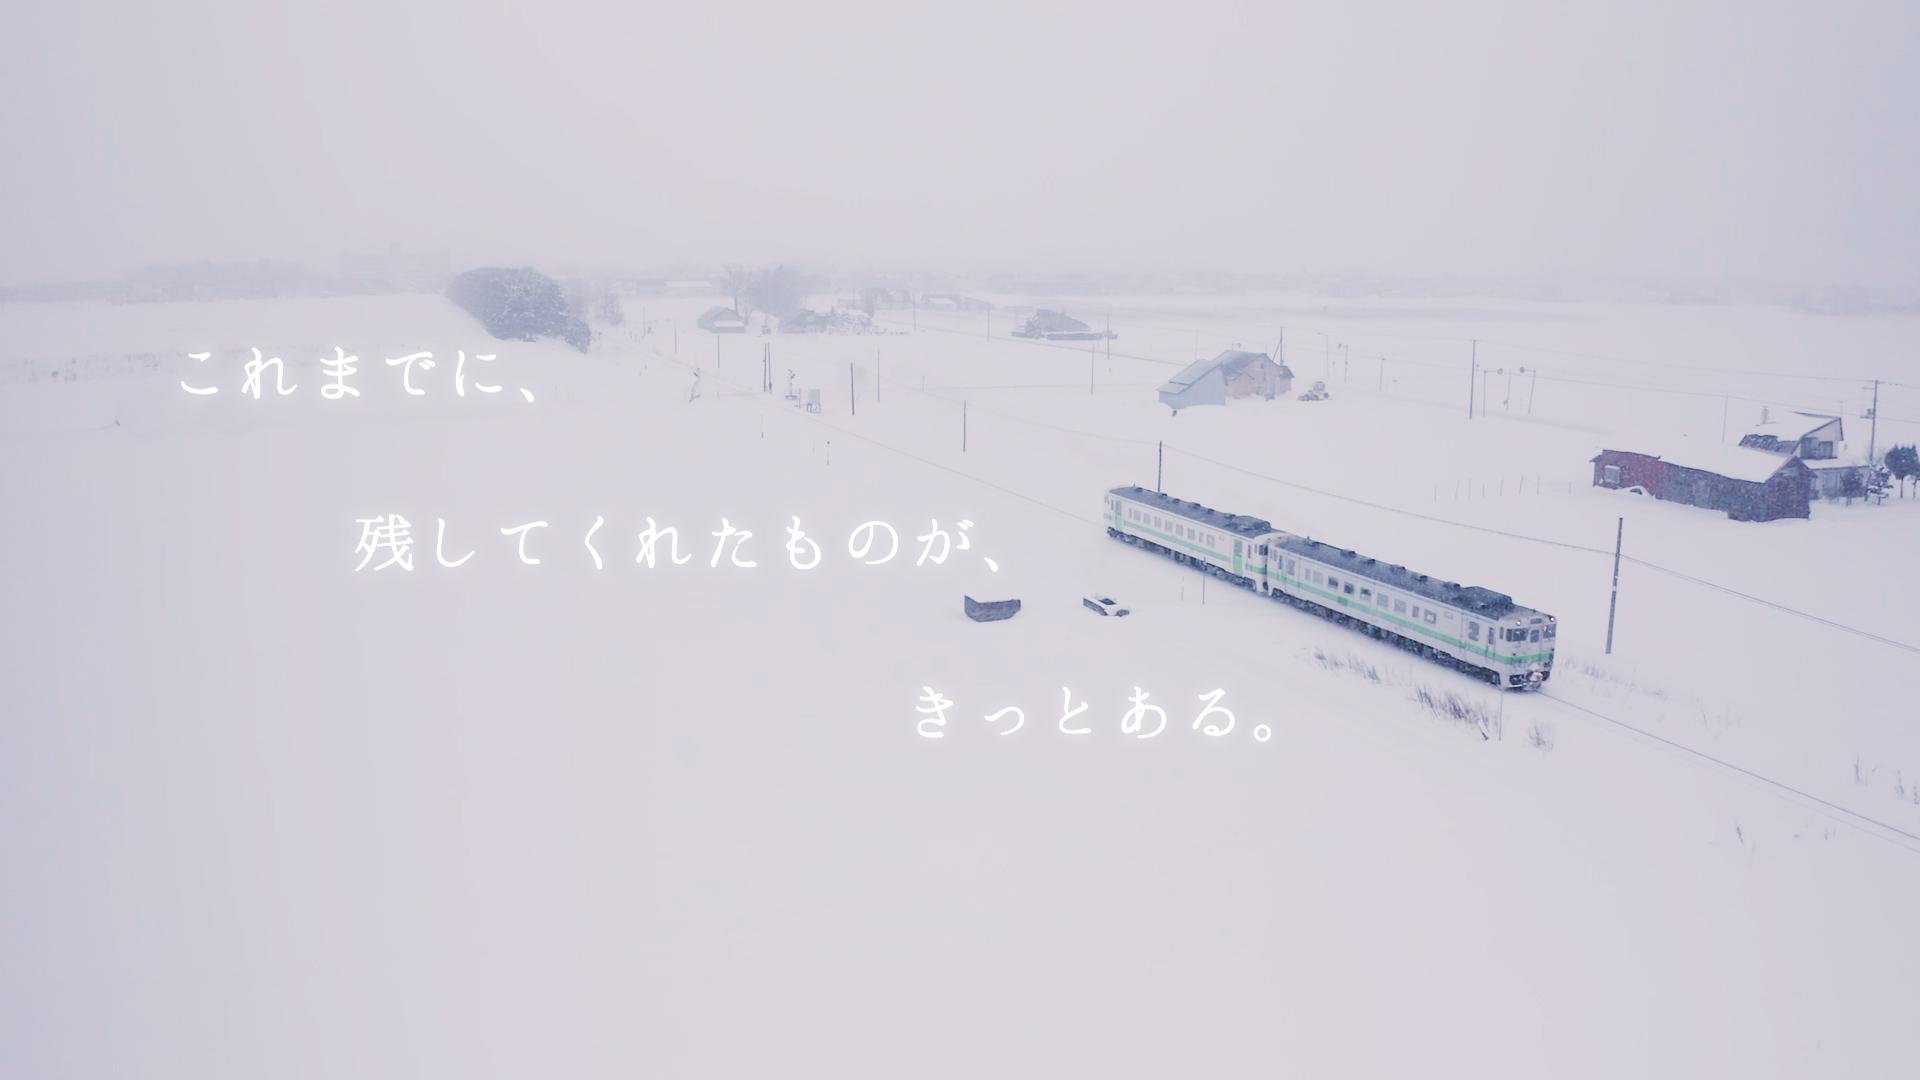 tmb_Shintotsukawa4